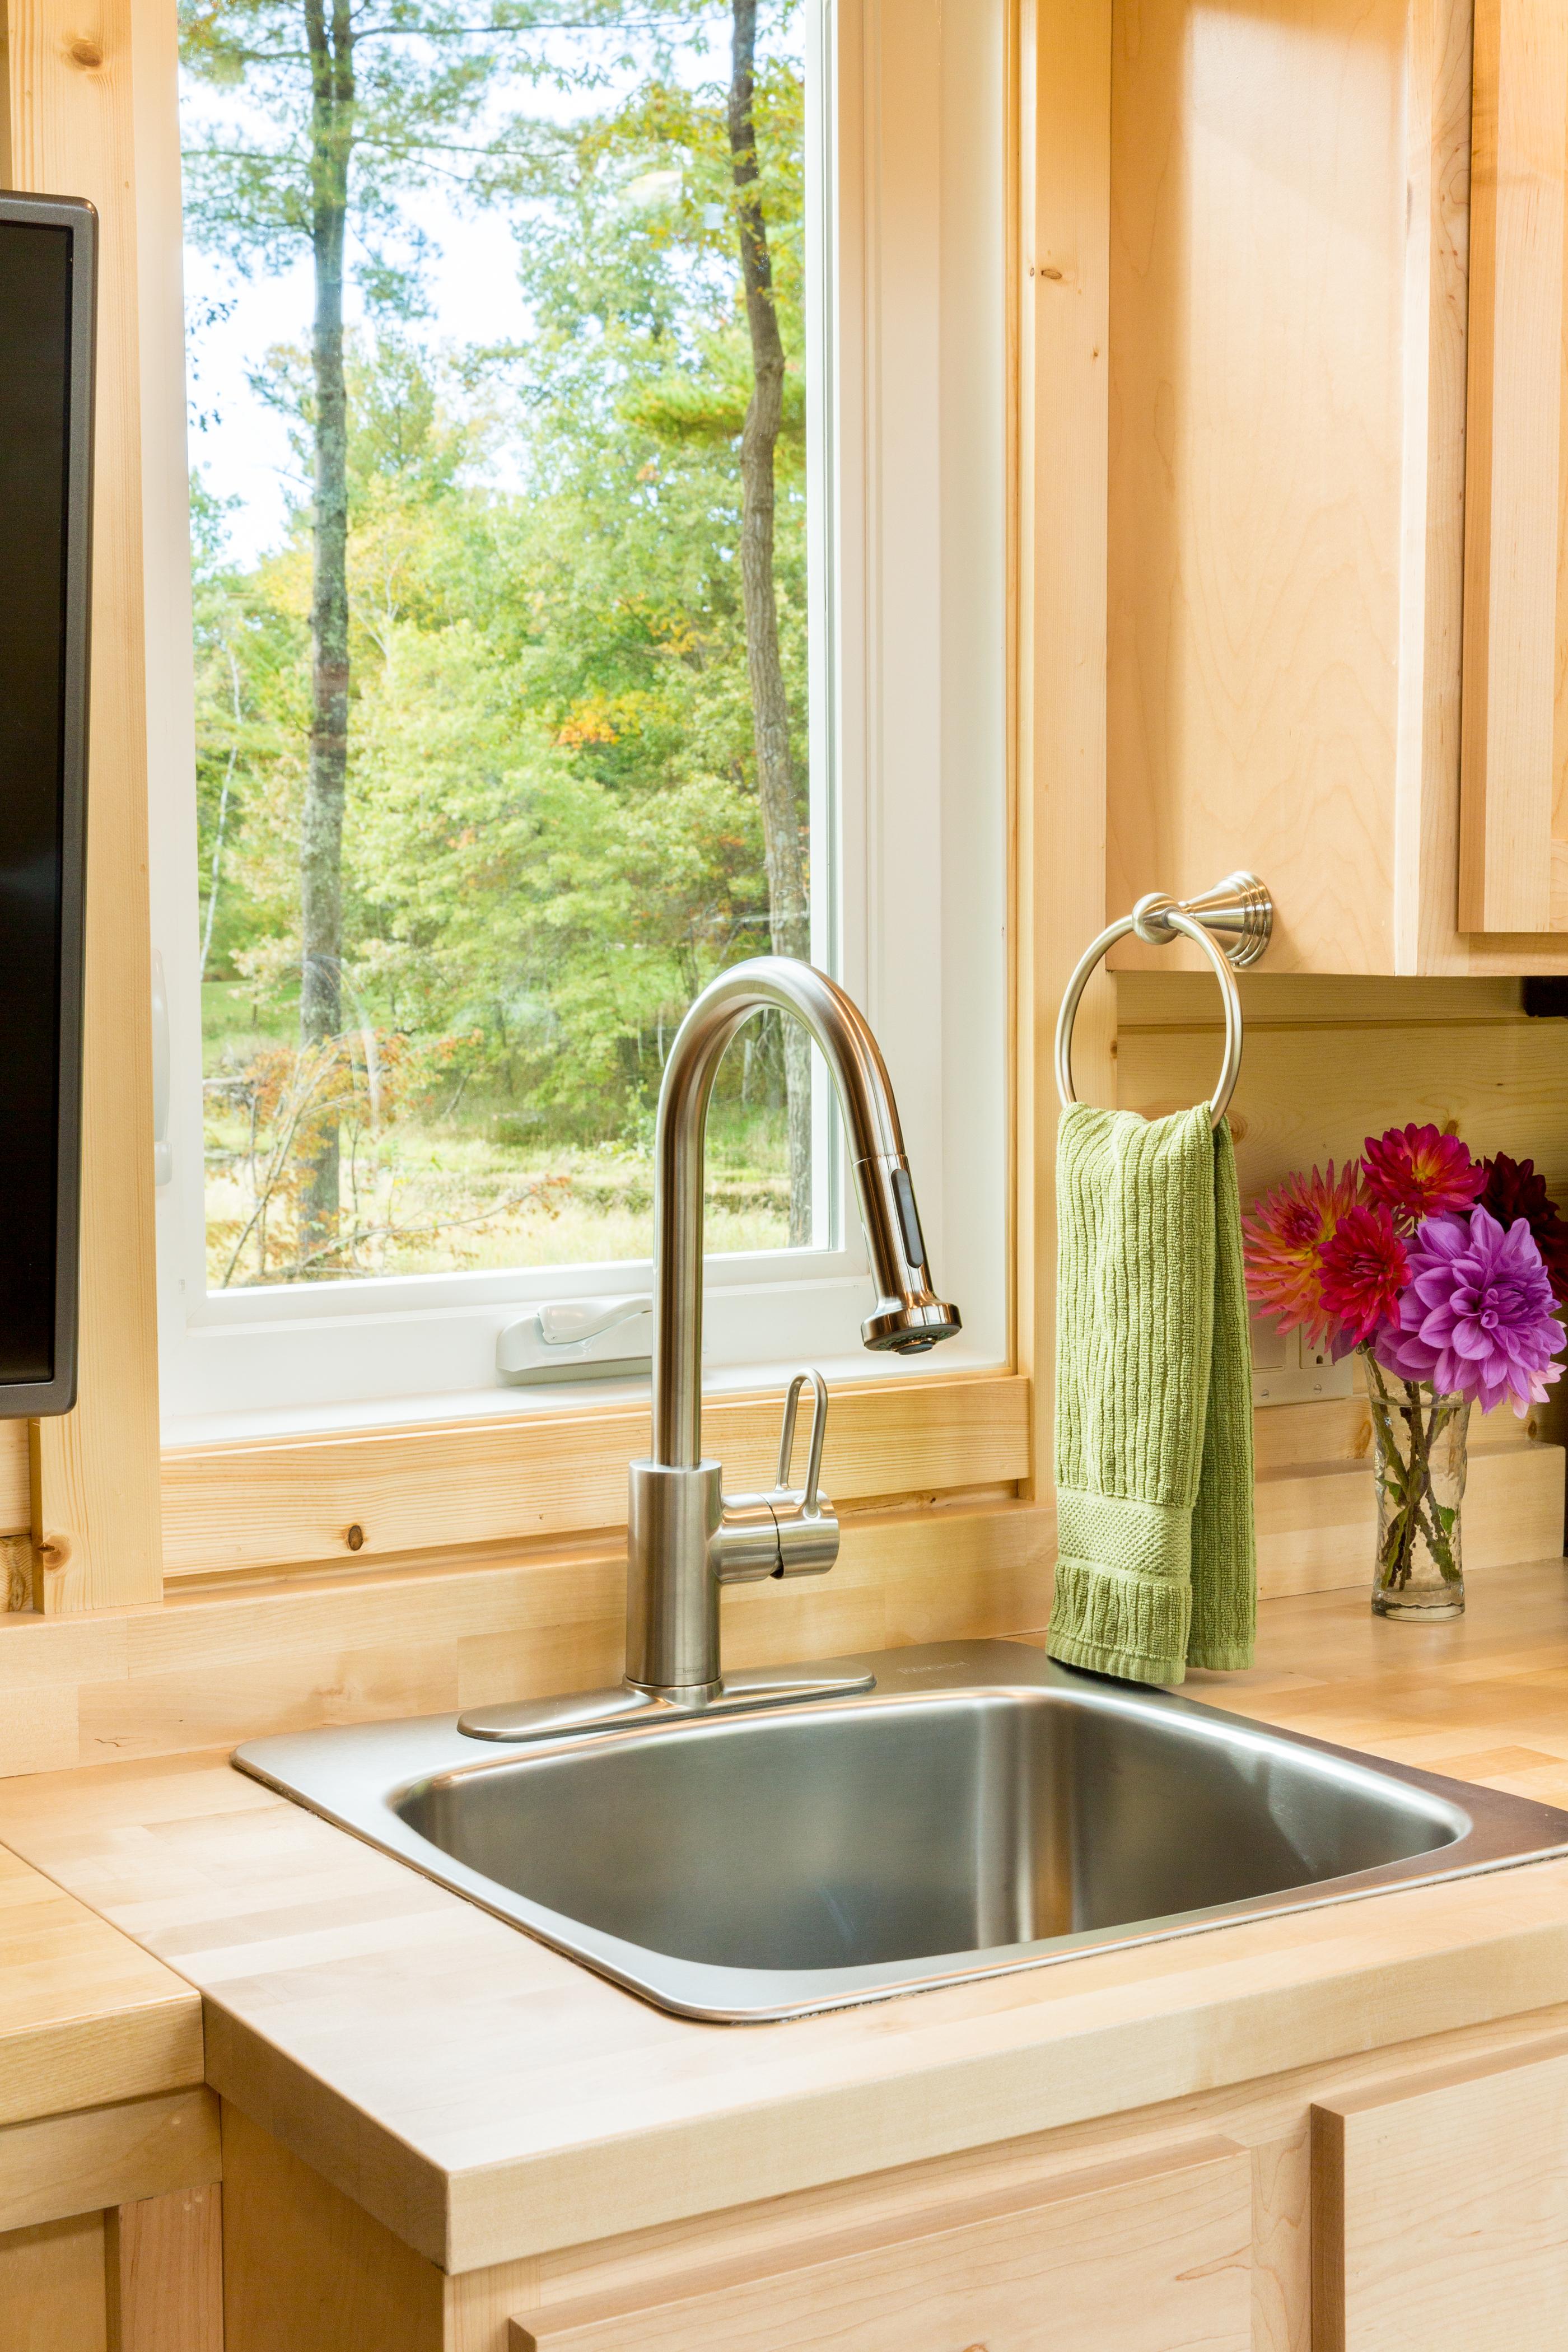 Designer faucet/seep sink